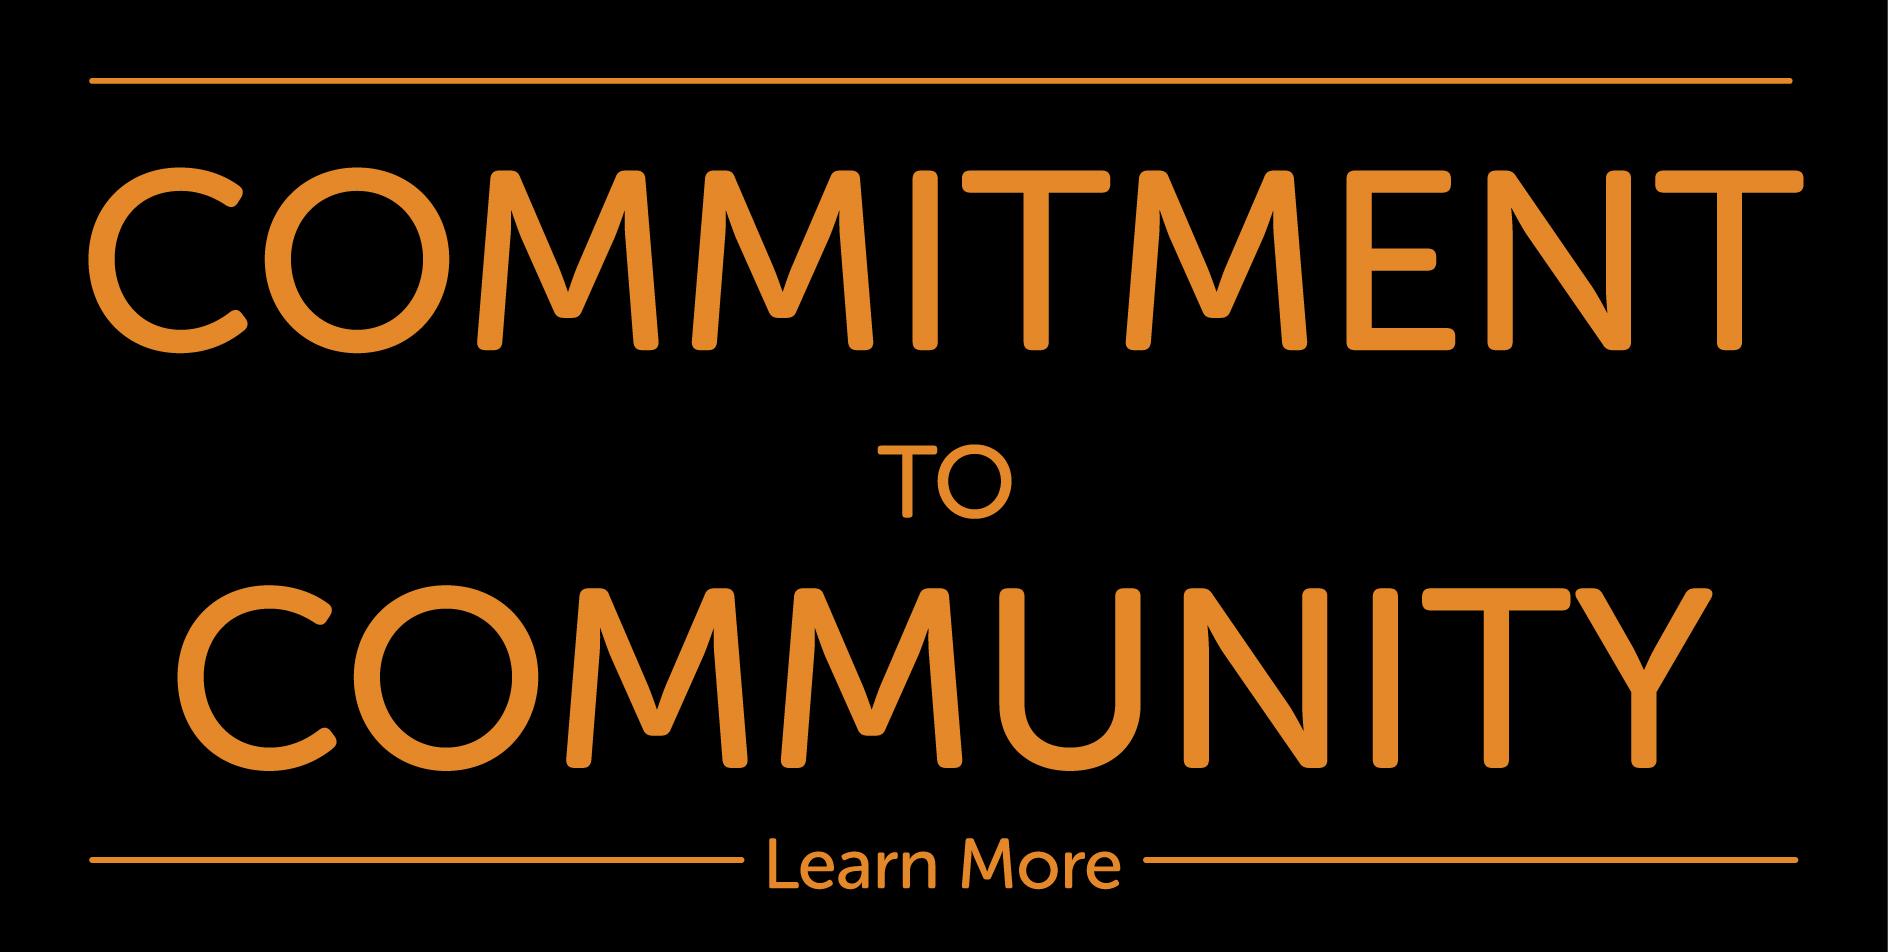 commitment to community overlay - orange